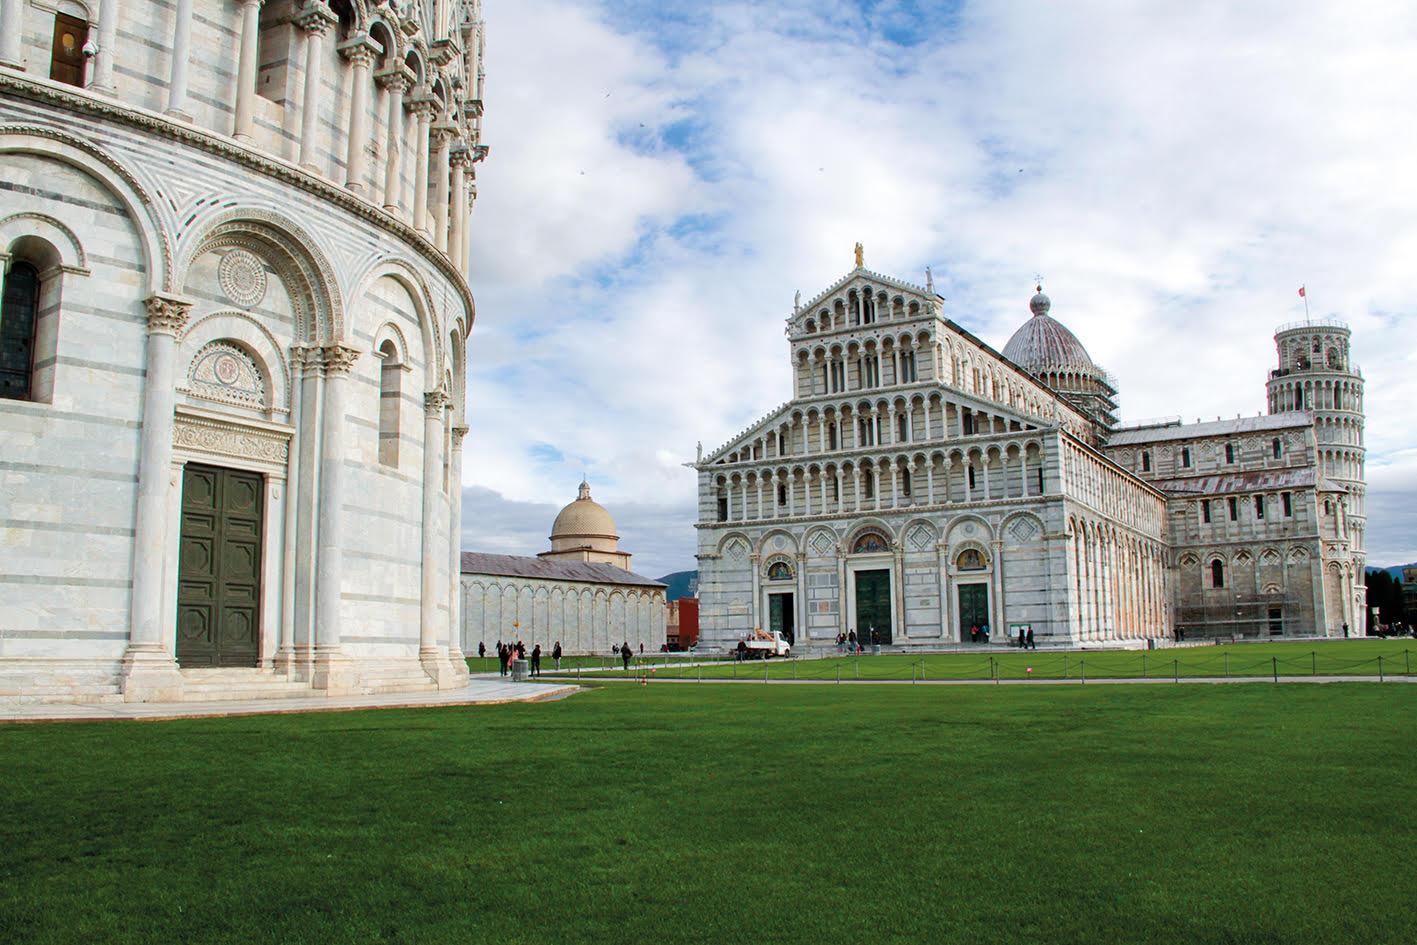 Scopri Pisa INSIEME – Visite guidate   Pisa